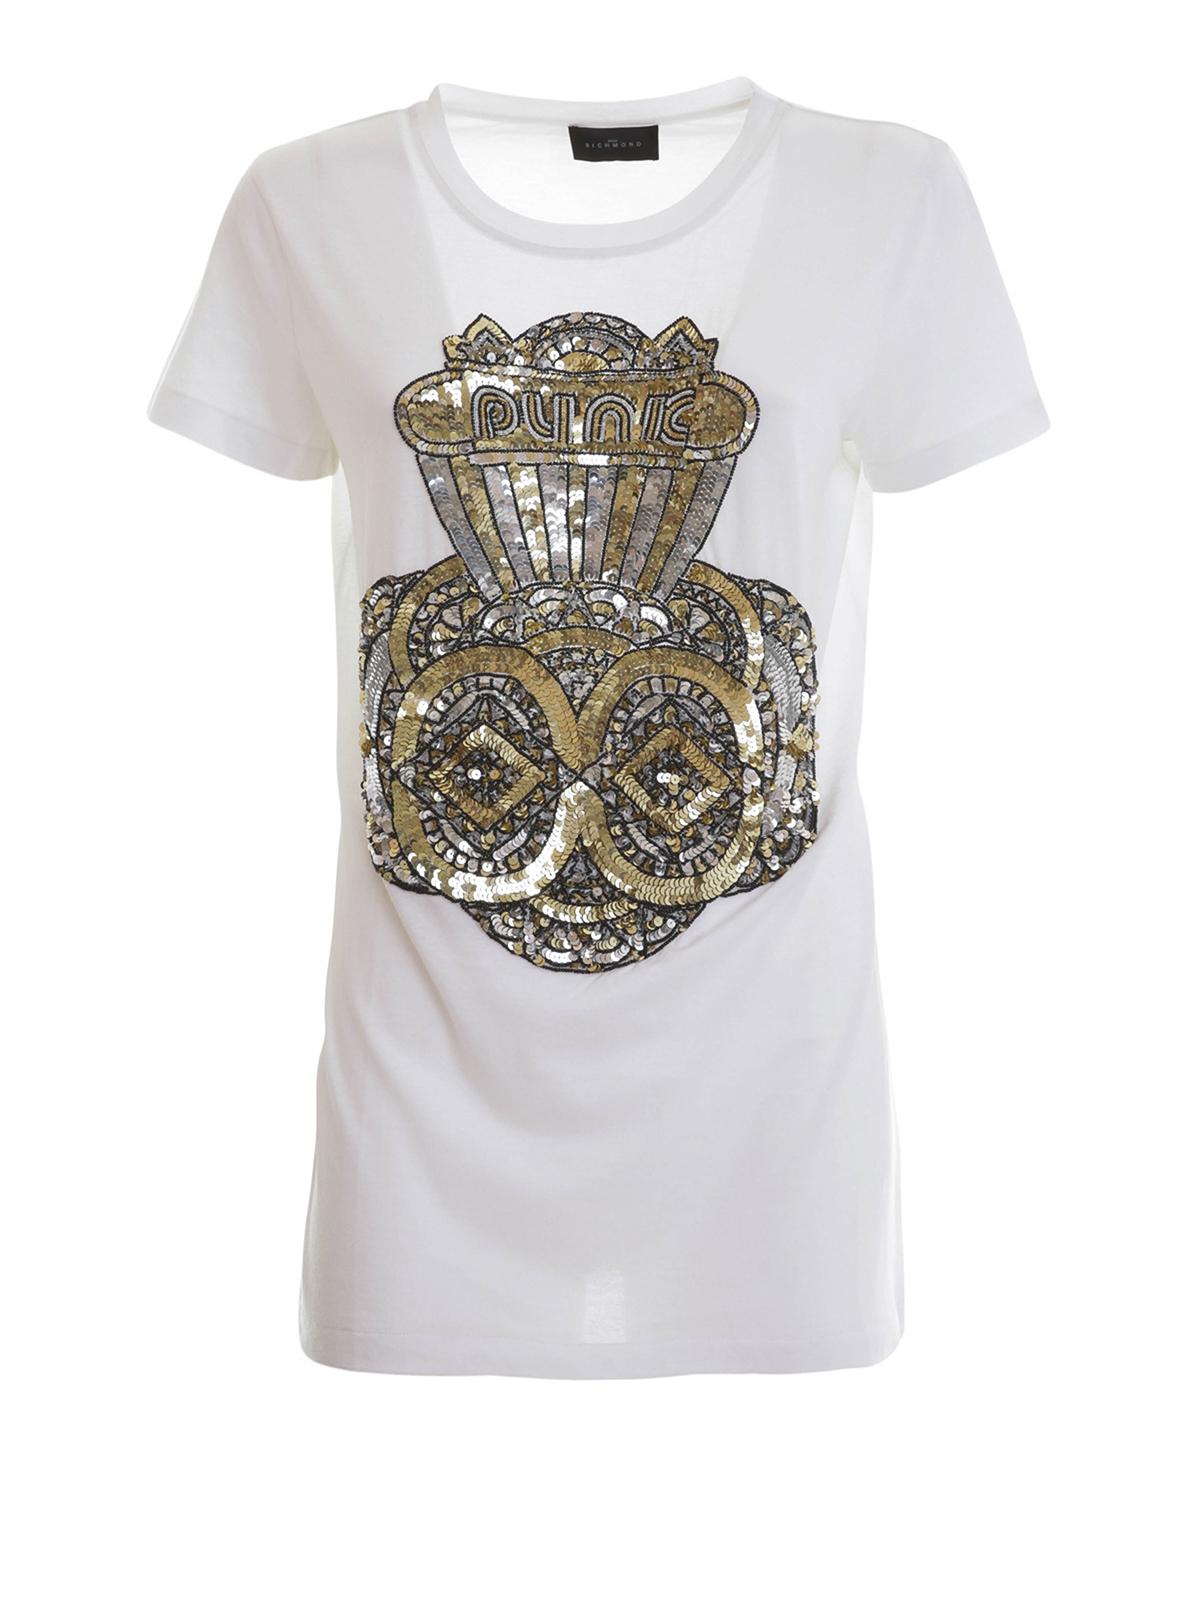 sequin t shirt by john richmond t shirts ikrix. Black Bedroom Furniture Sets. Home Design Ideas